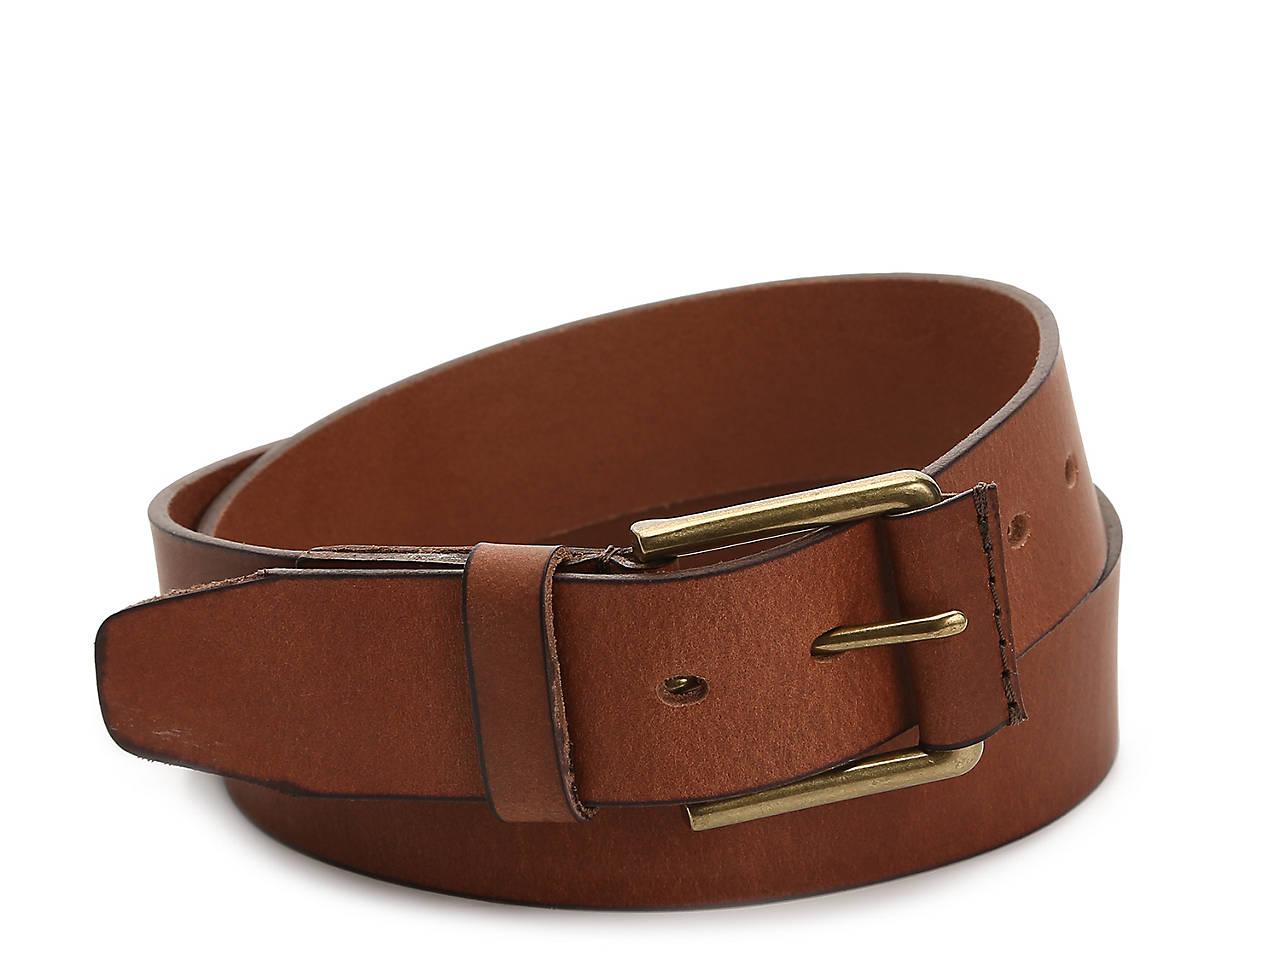 39f9bd803e3 Timberland Pull Up Men's Leather Belt Men's Handbags & Accessories | DSW